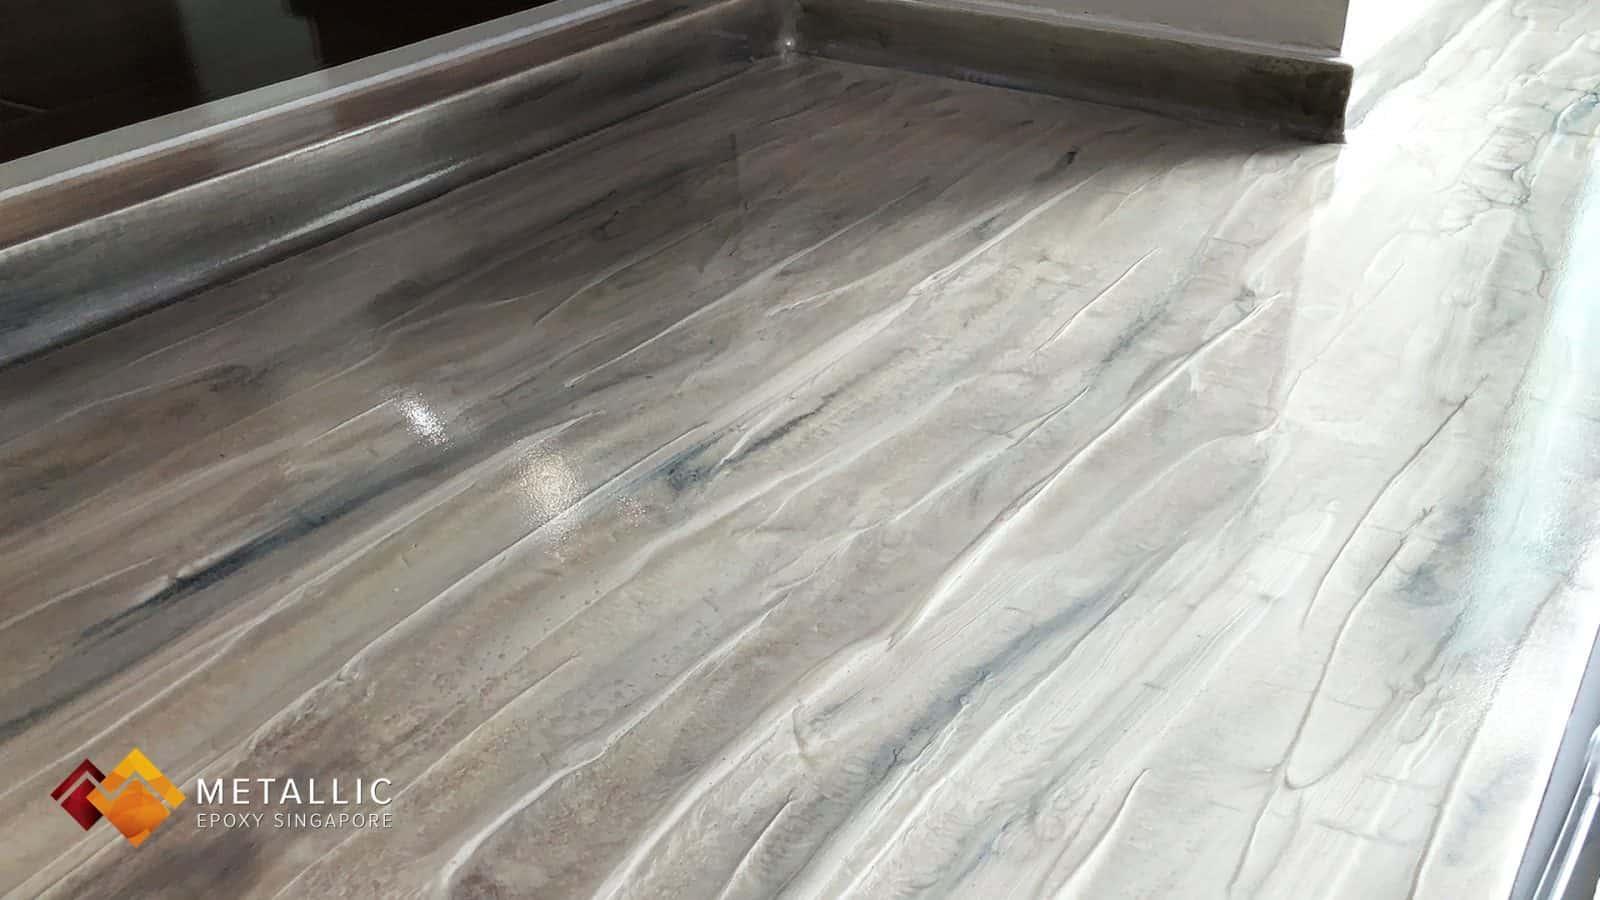 Metallic Epoxy Singapore Natural Grey Wood Countertop